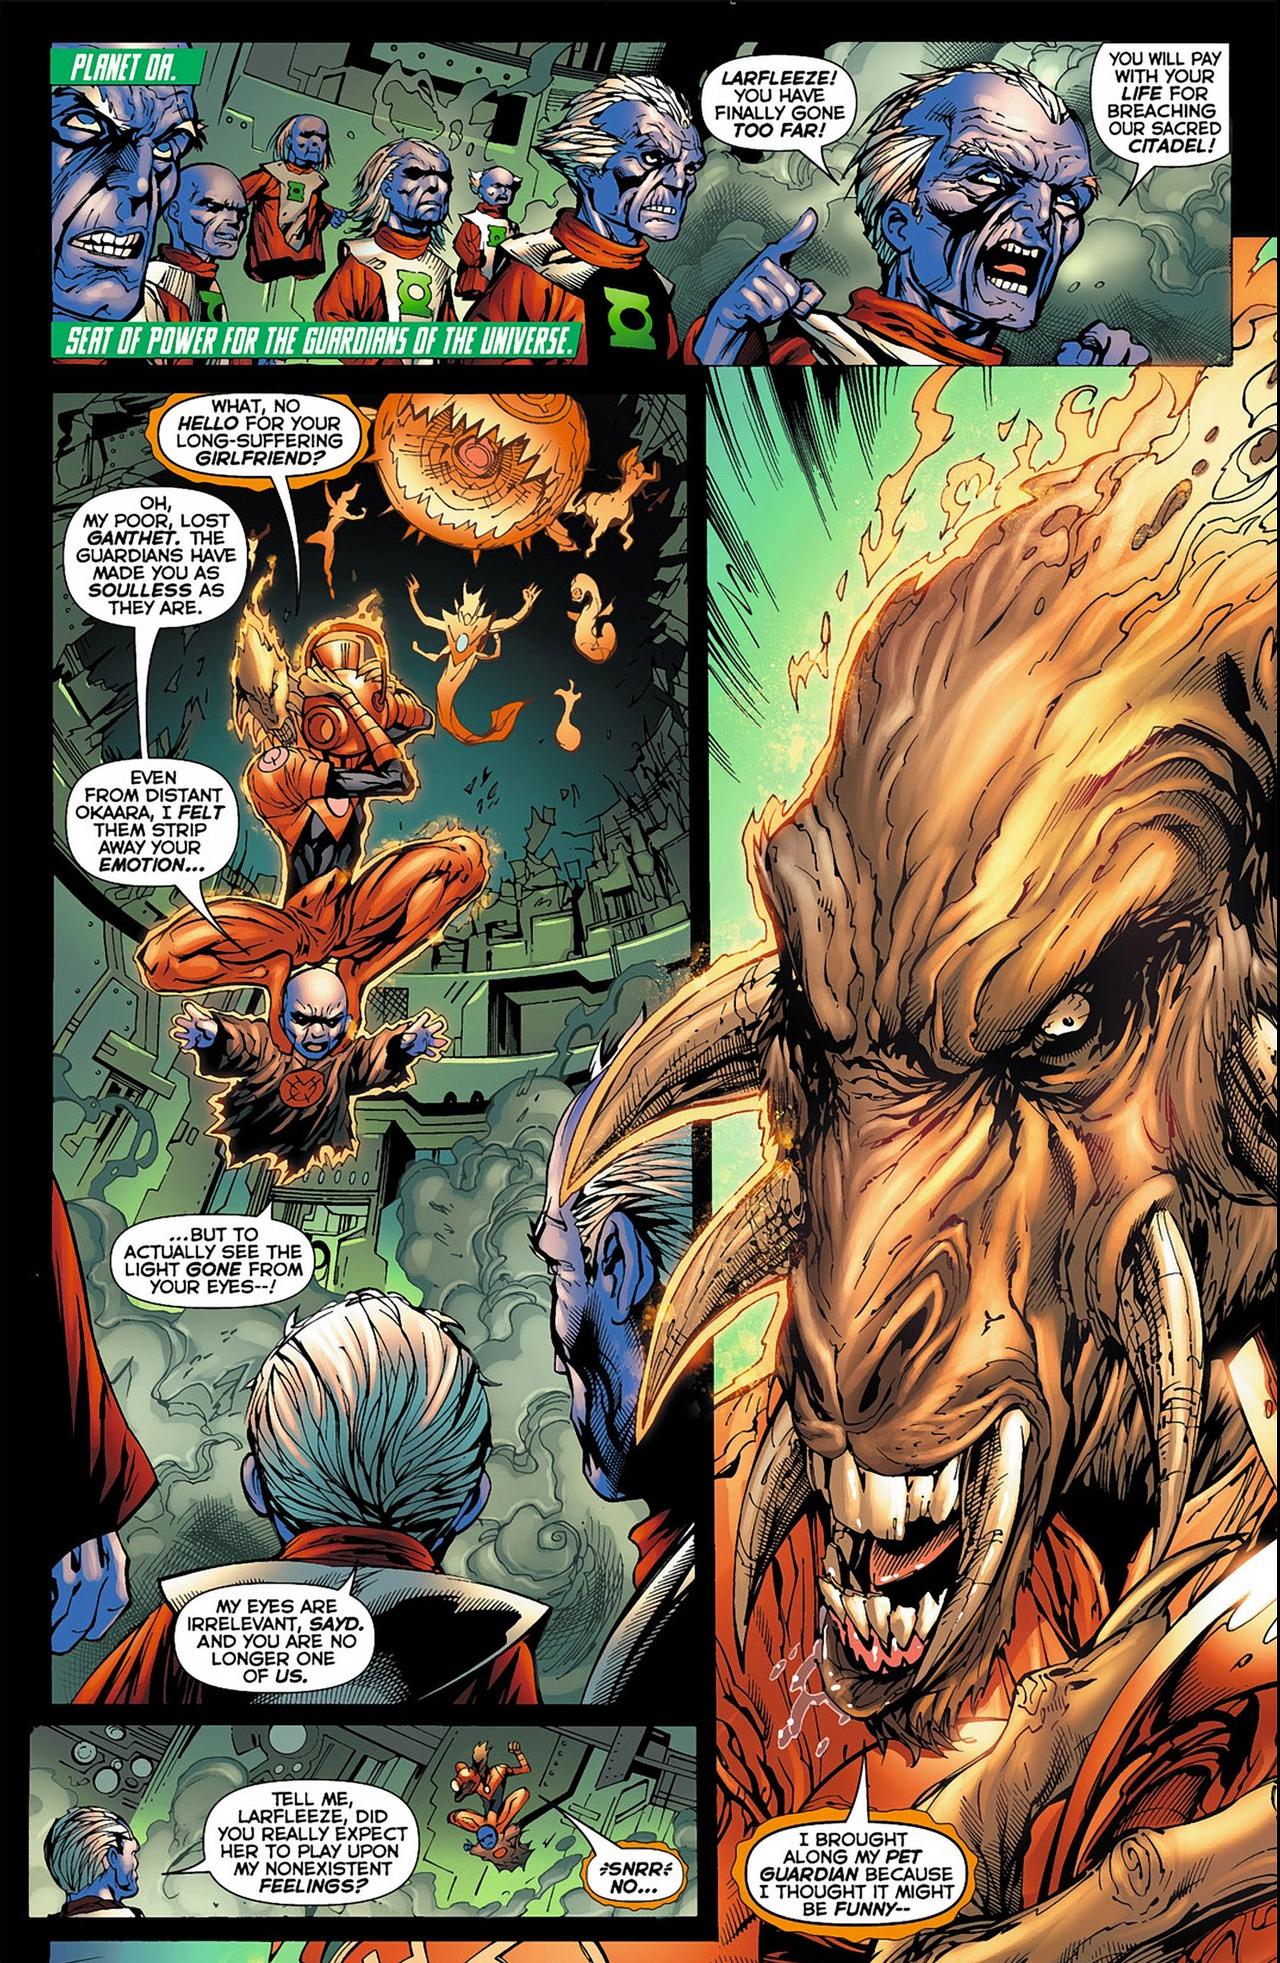 larfleeze vs the guardians of the universe